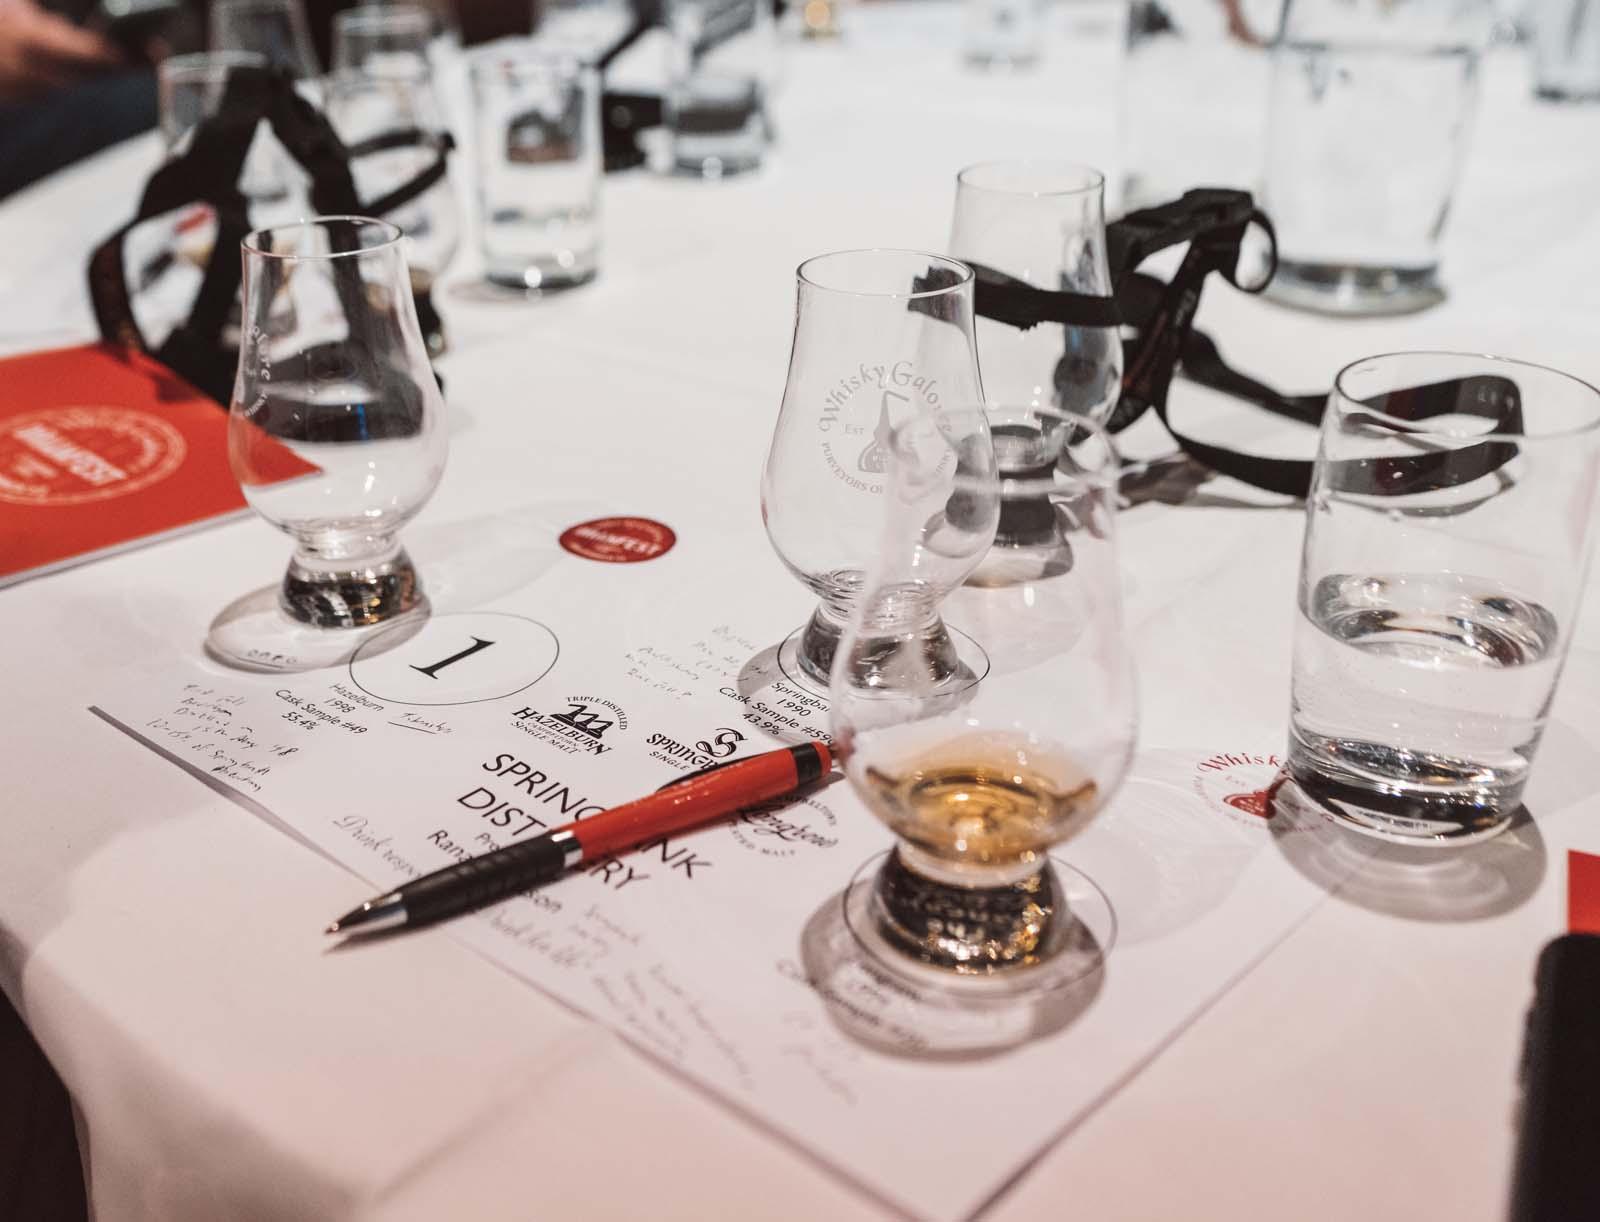 Dramfest 2018 for Whisky Galore-349.jpg